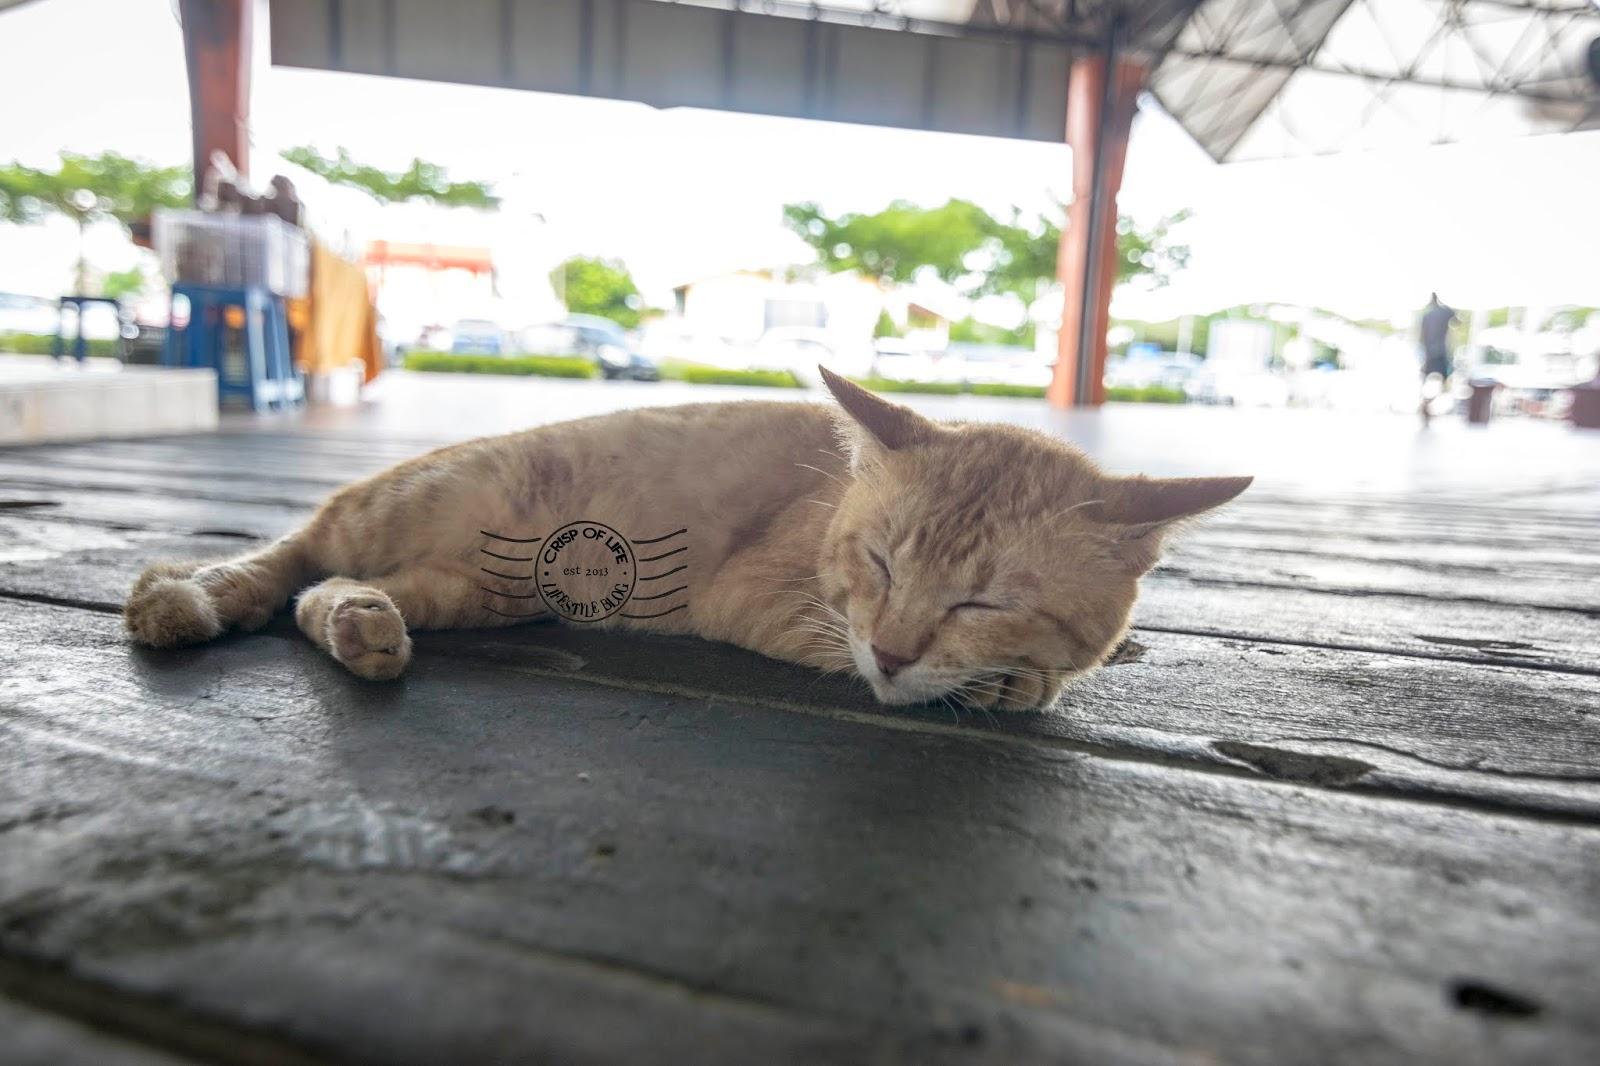 Satok Weekend Market - The Unique Excursion Into Local Market @ Kuching, Sarawak